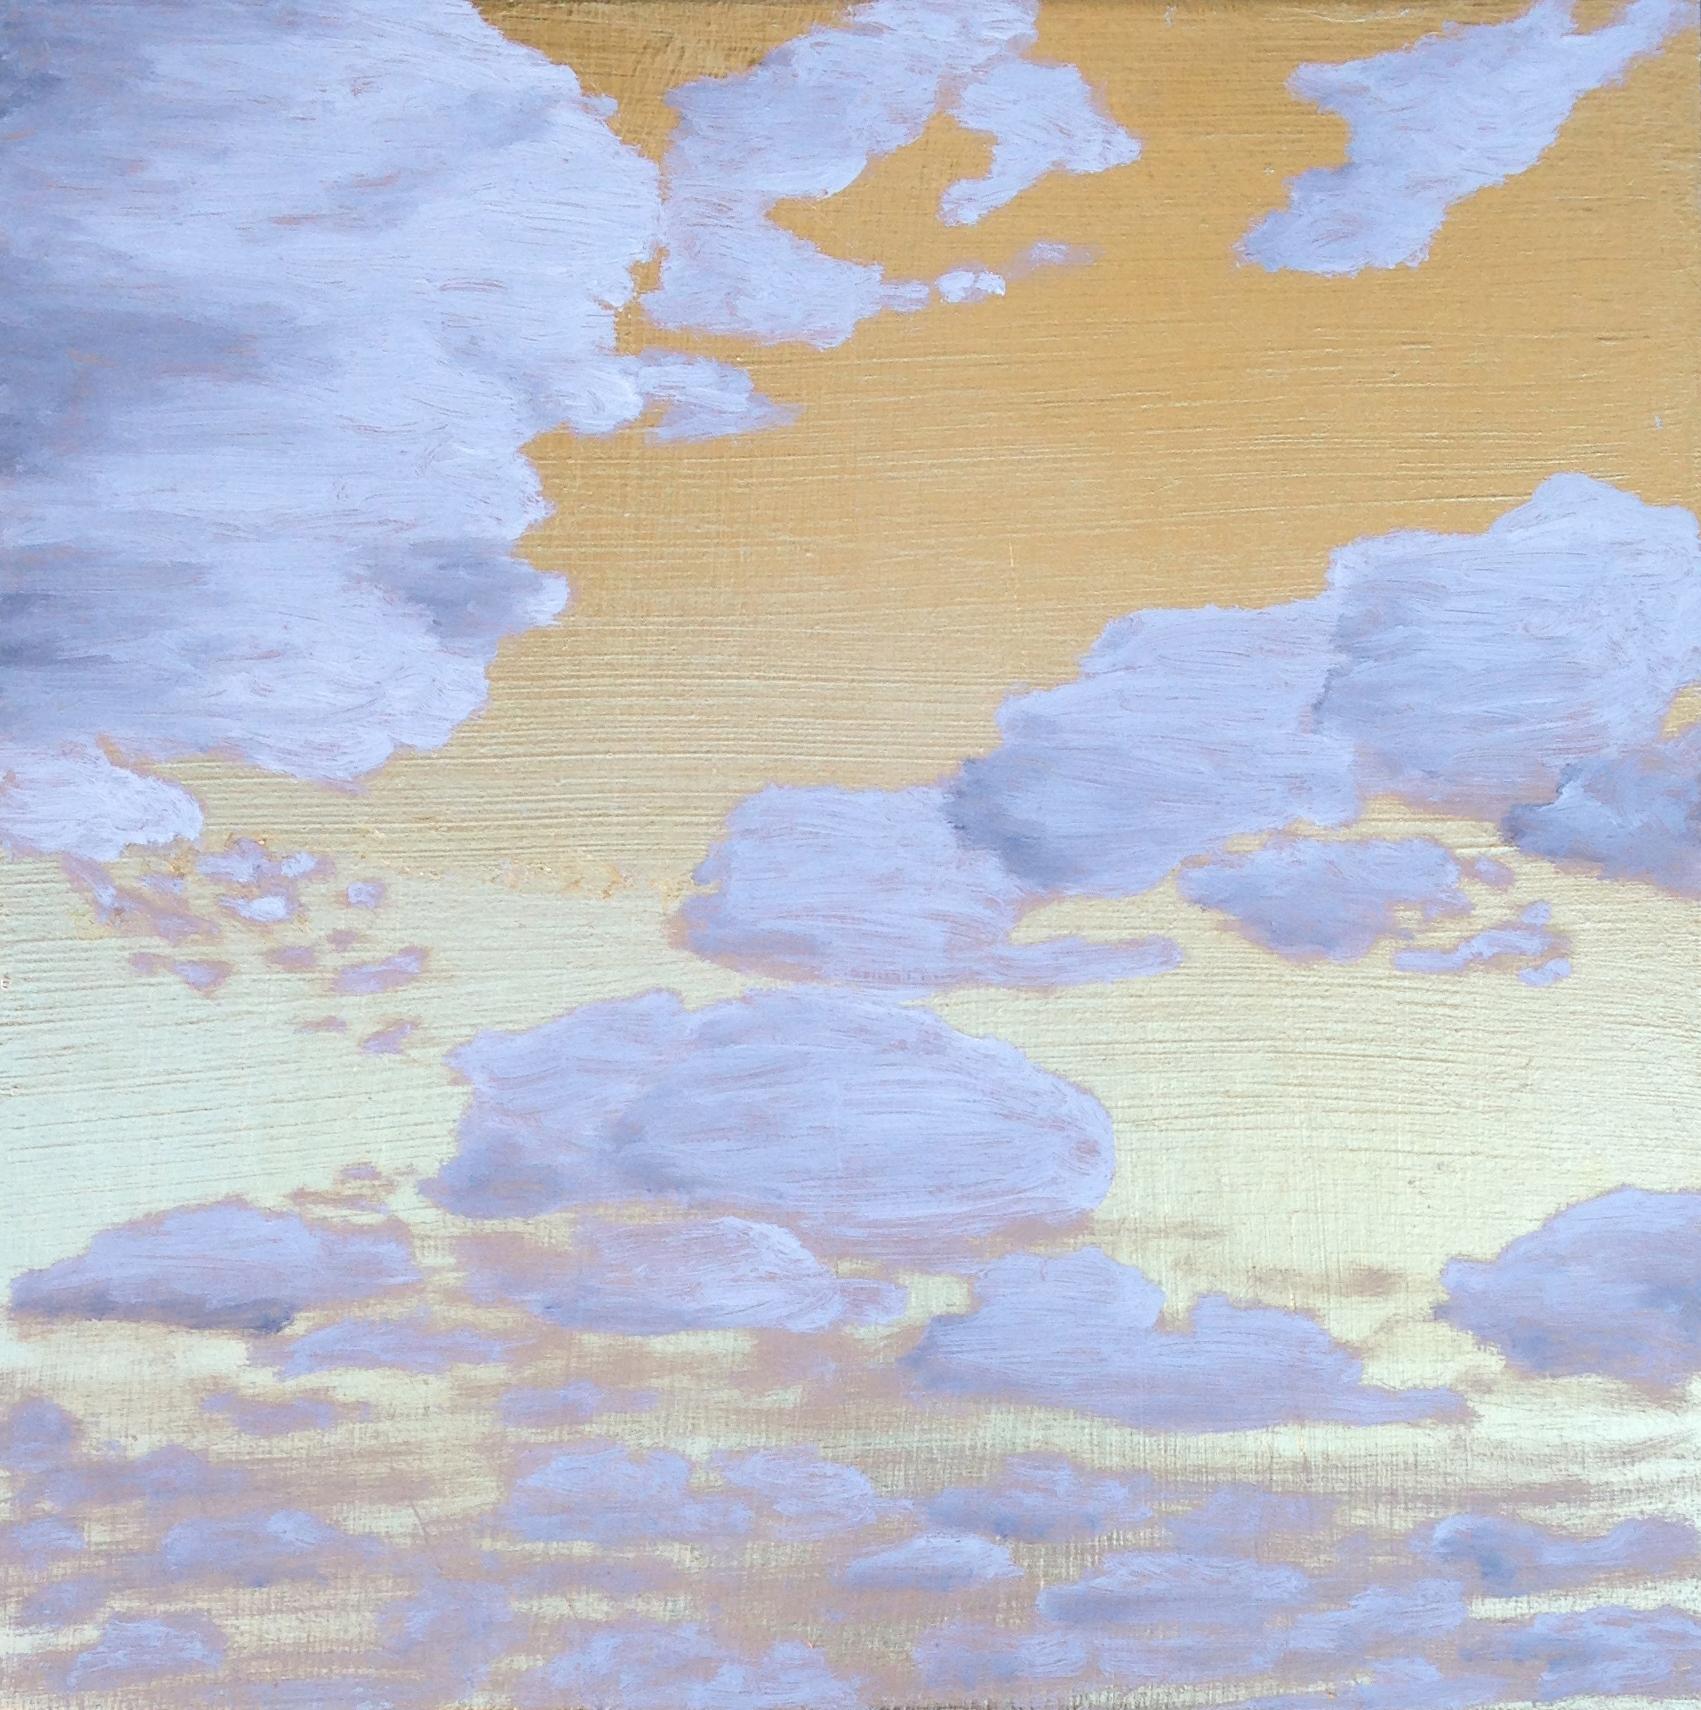 Cloud Study 1-18-14.jpg